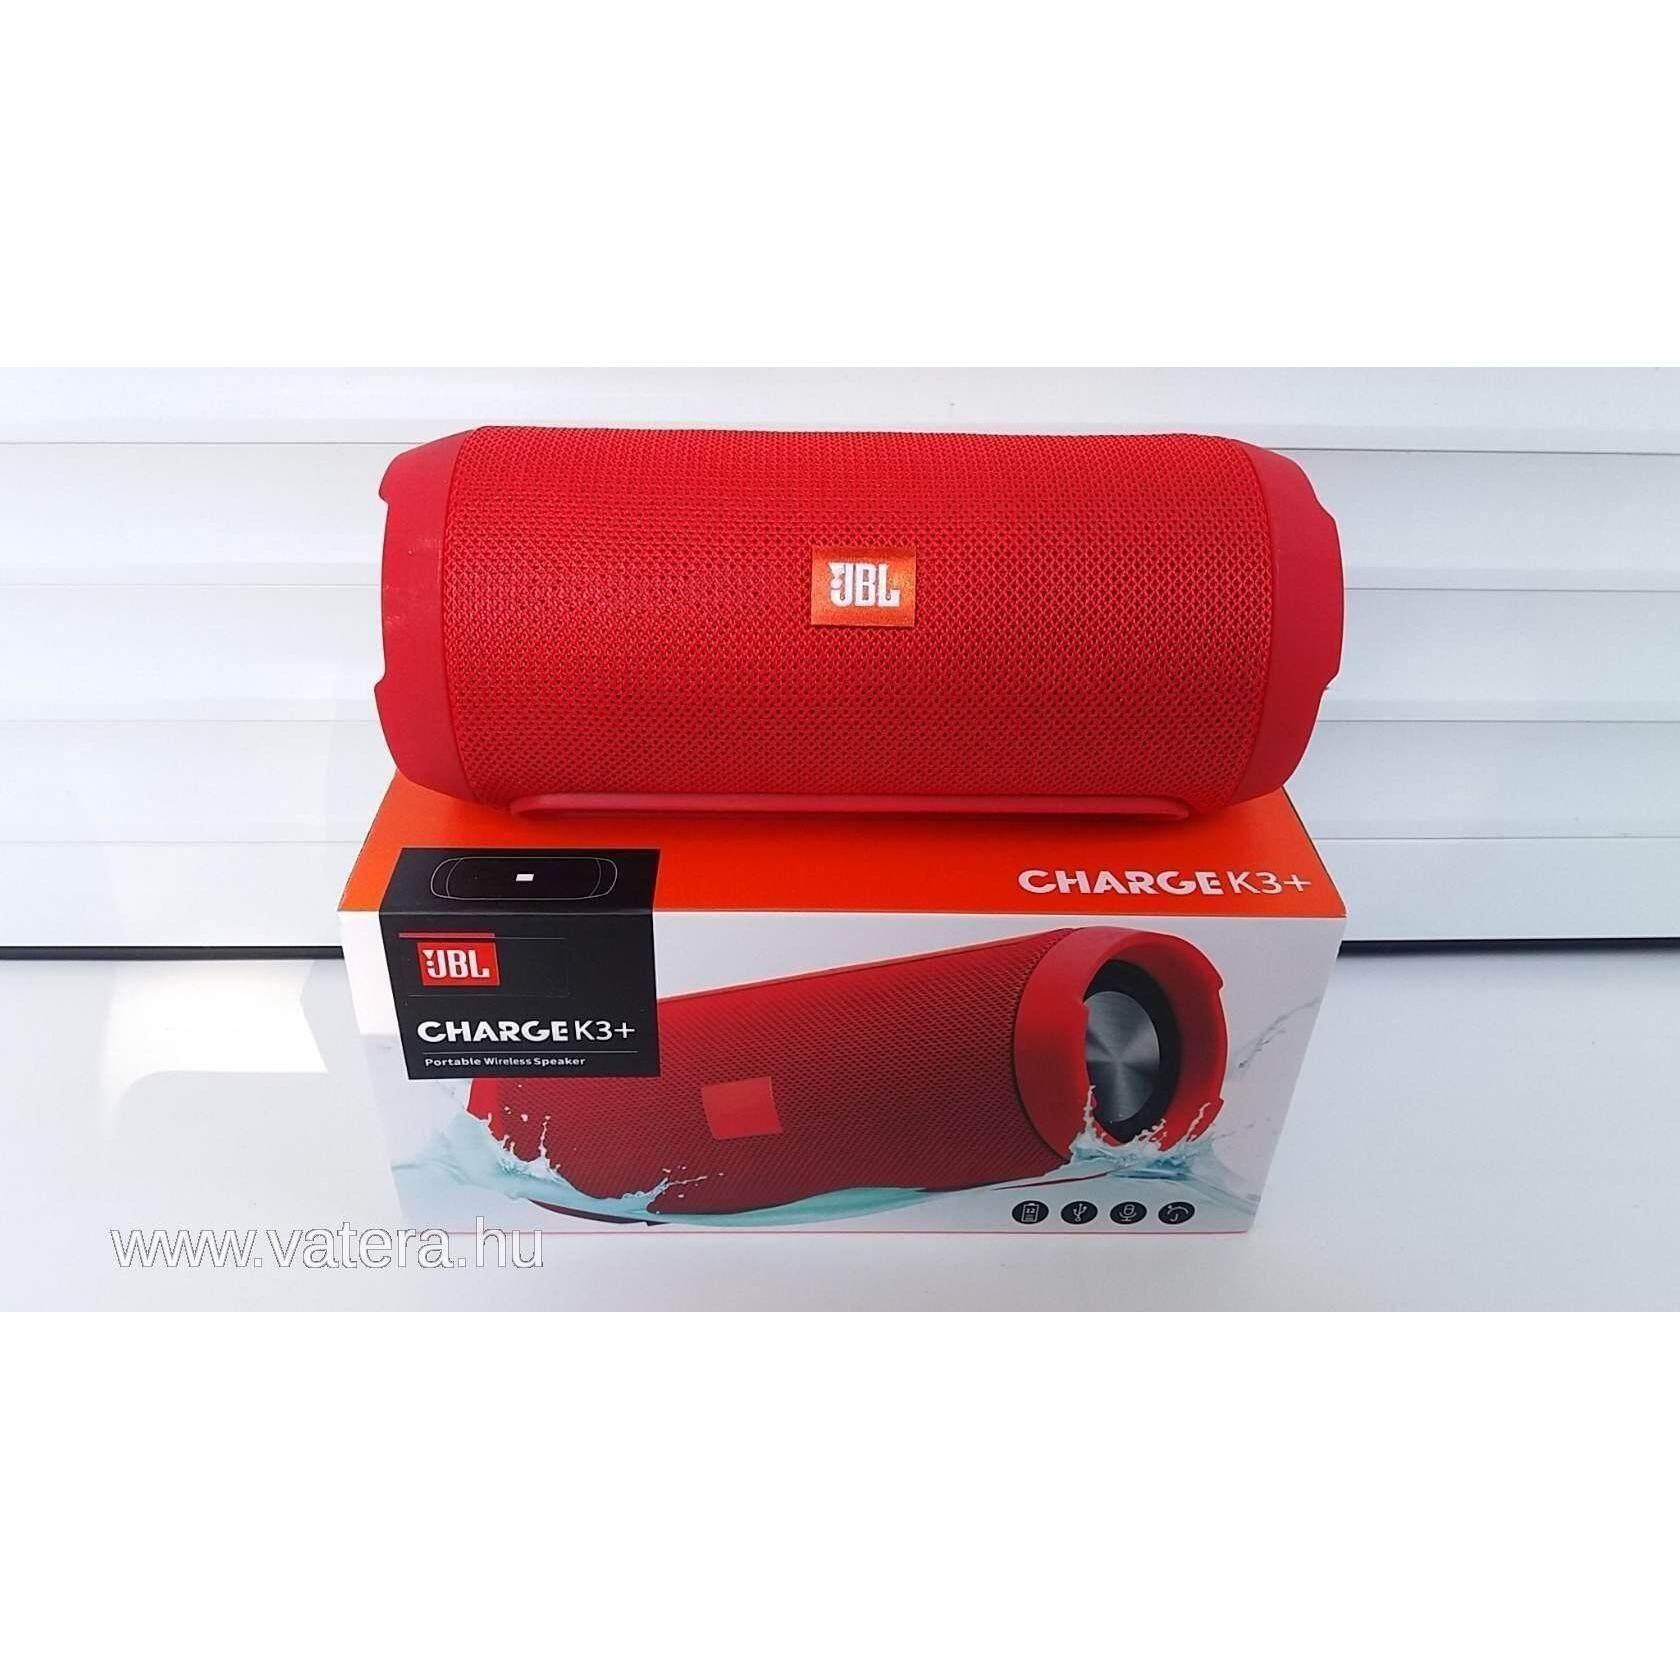 Cek Harga Jbl Charge 3 Waterproof Portable Bluetooth Speaker Black Splashproof Wireless Oem Product High Quality Red